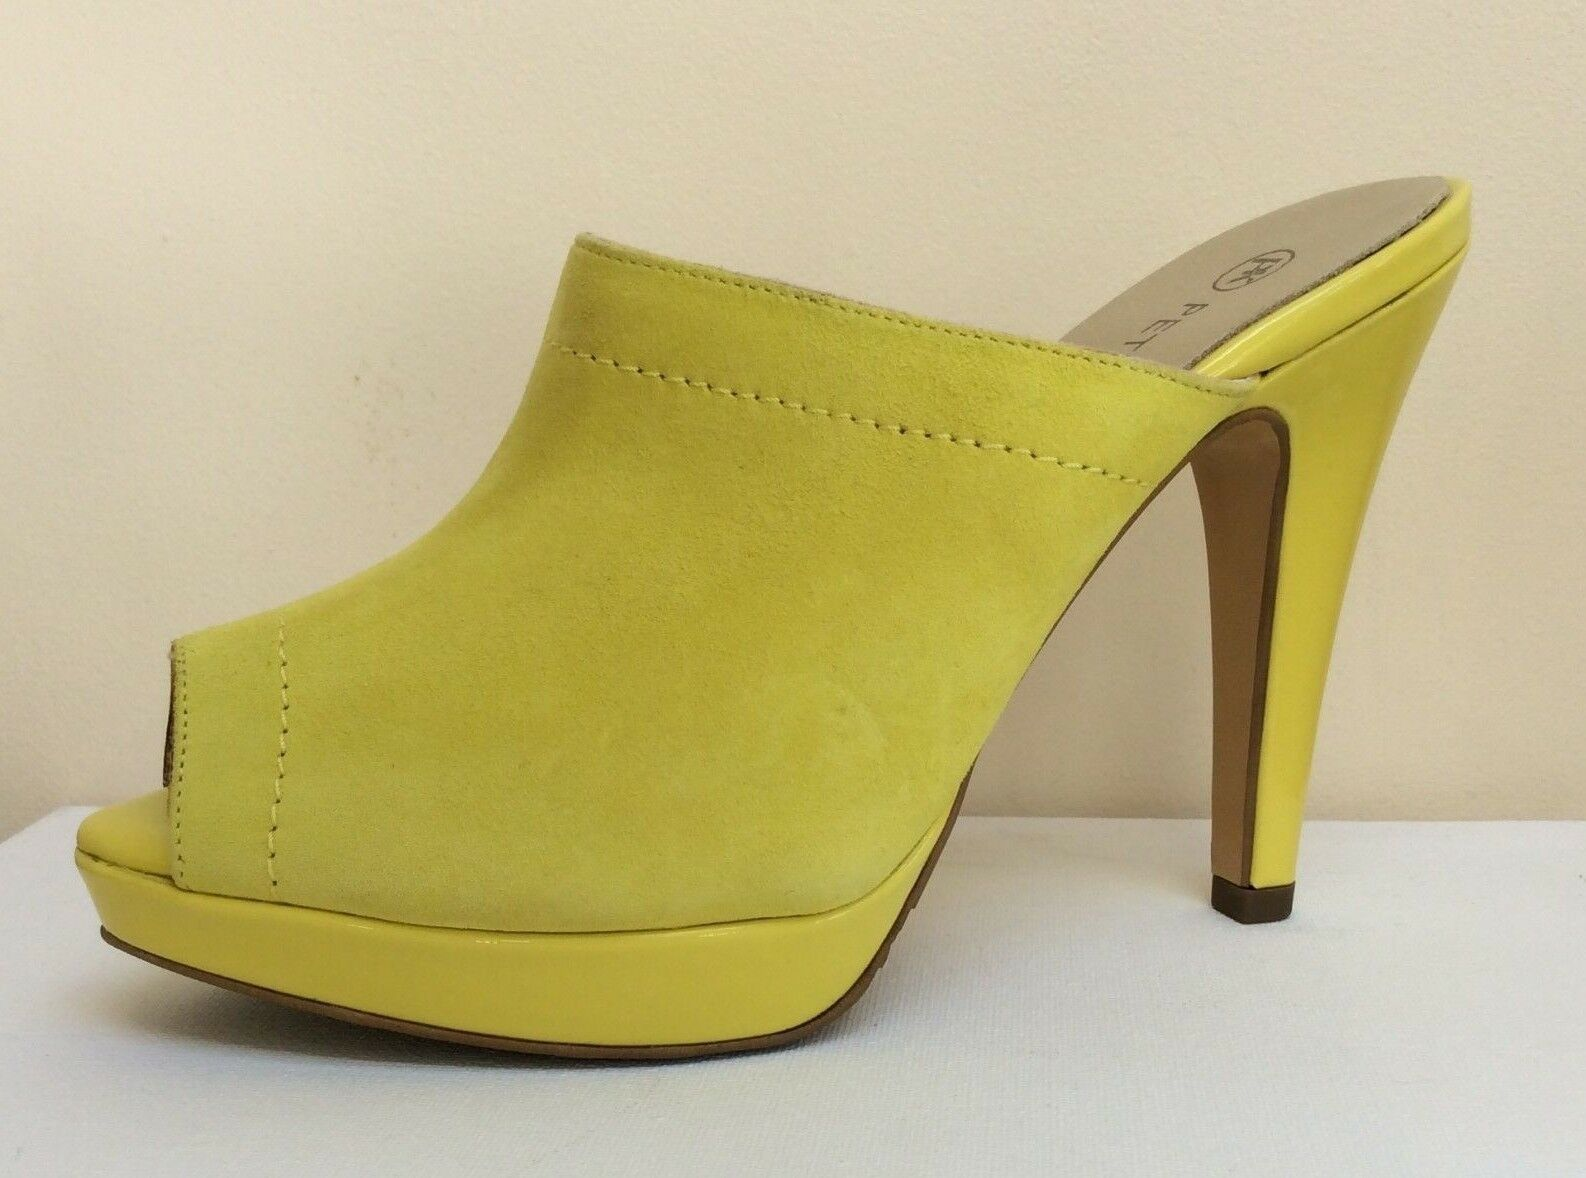 Peter Kaiser Palia lemon-yellow suede/patent mules, UK 4/EU 37,    BNWB